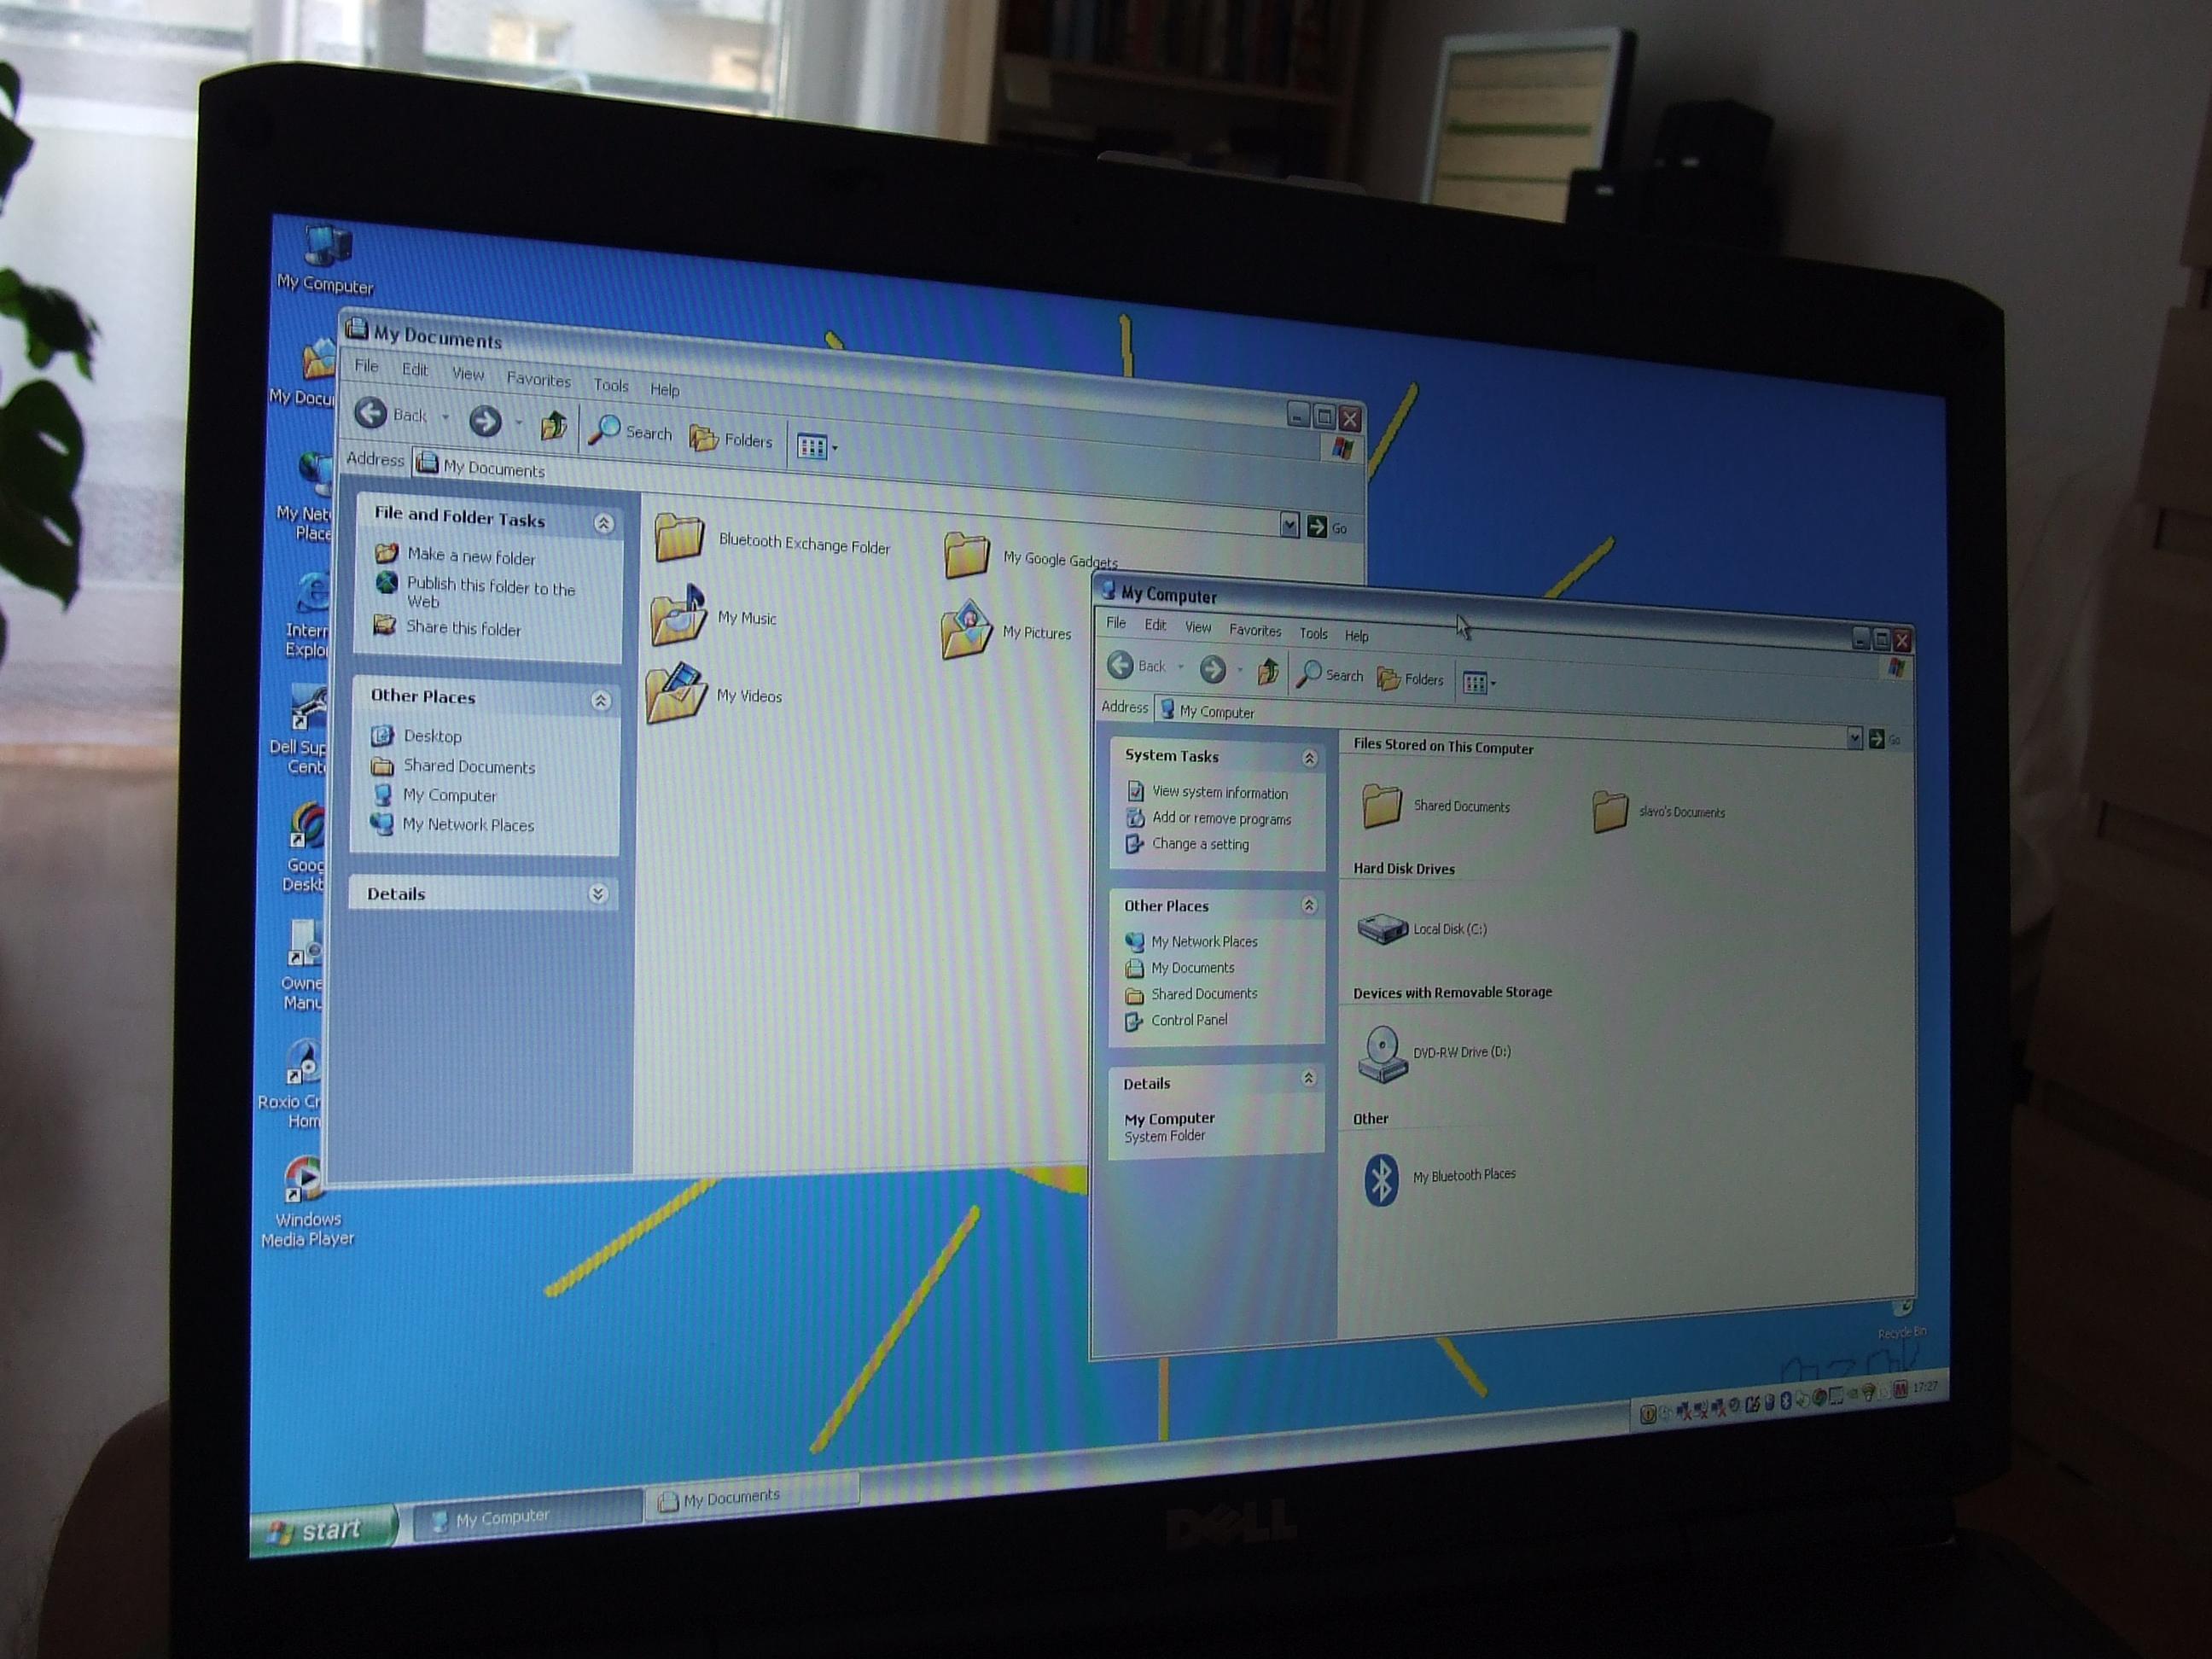 [Sprzedam] Laptop DELL Vostro 1700 idealny + oryginalna torba GRATIS